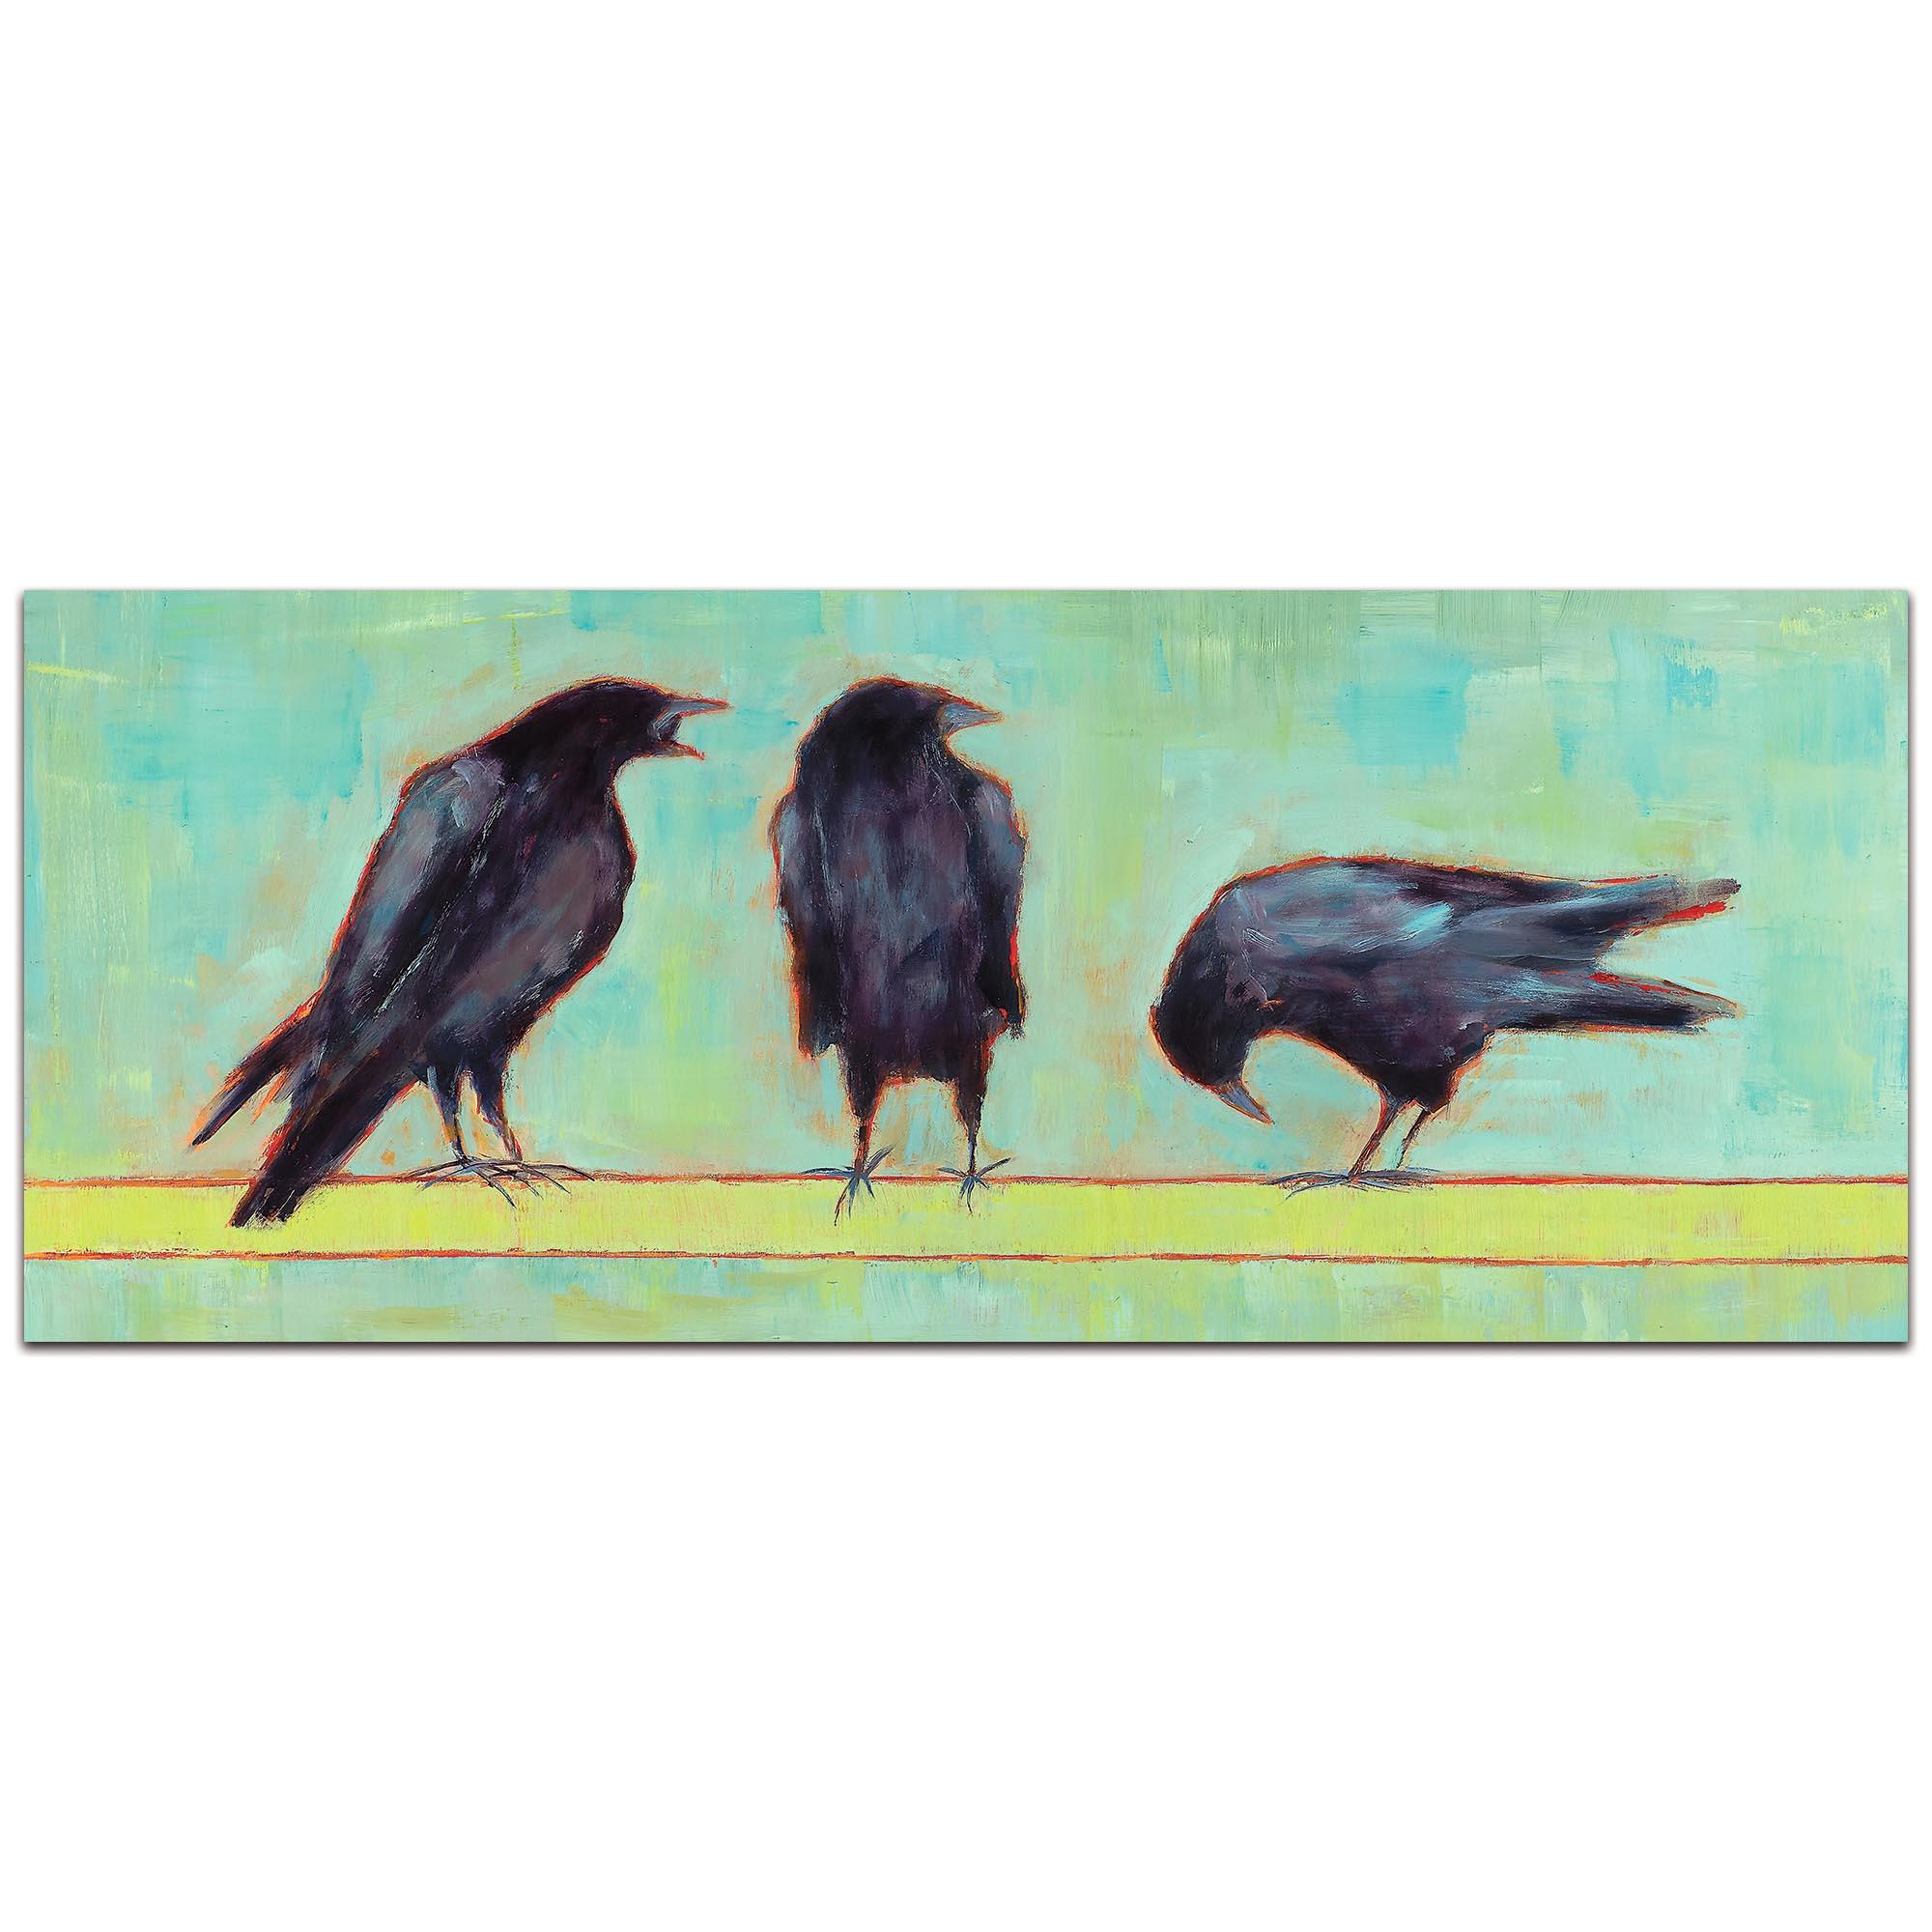 Contemporary Wall Art 'Crow Bar 1 v2' - Urban Birds Decor on Metal or Plexiglass